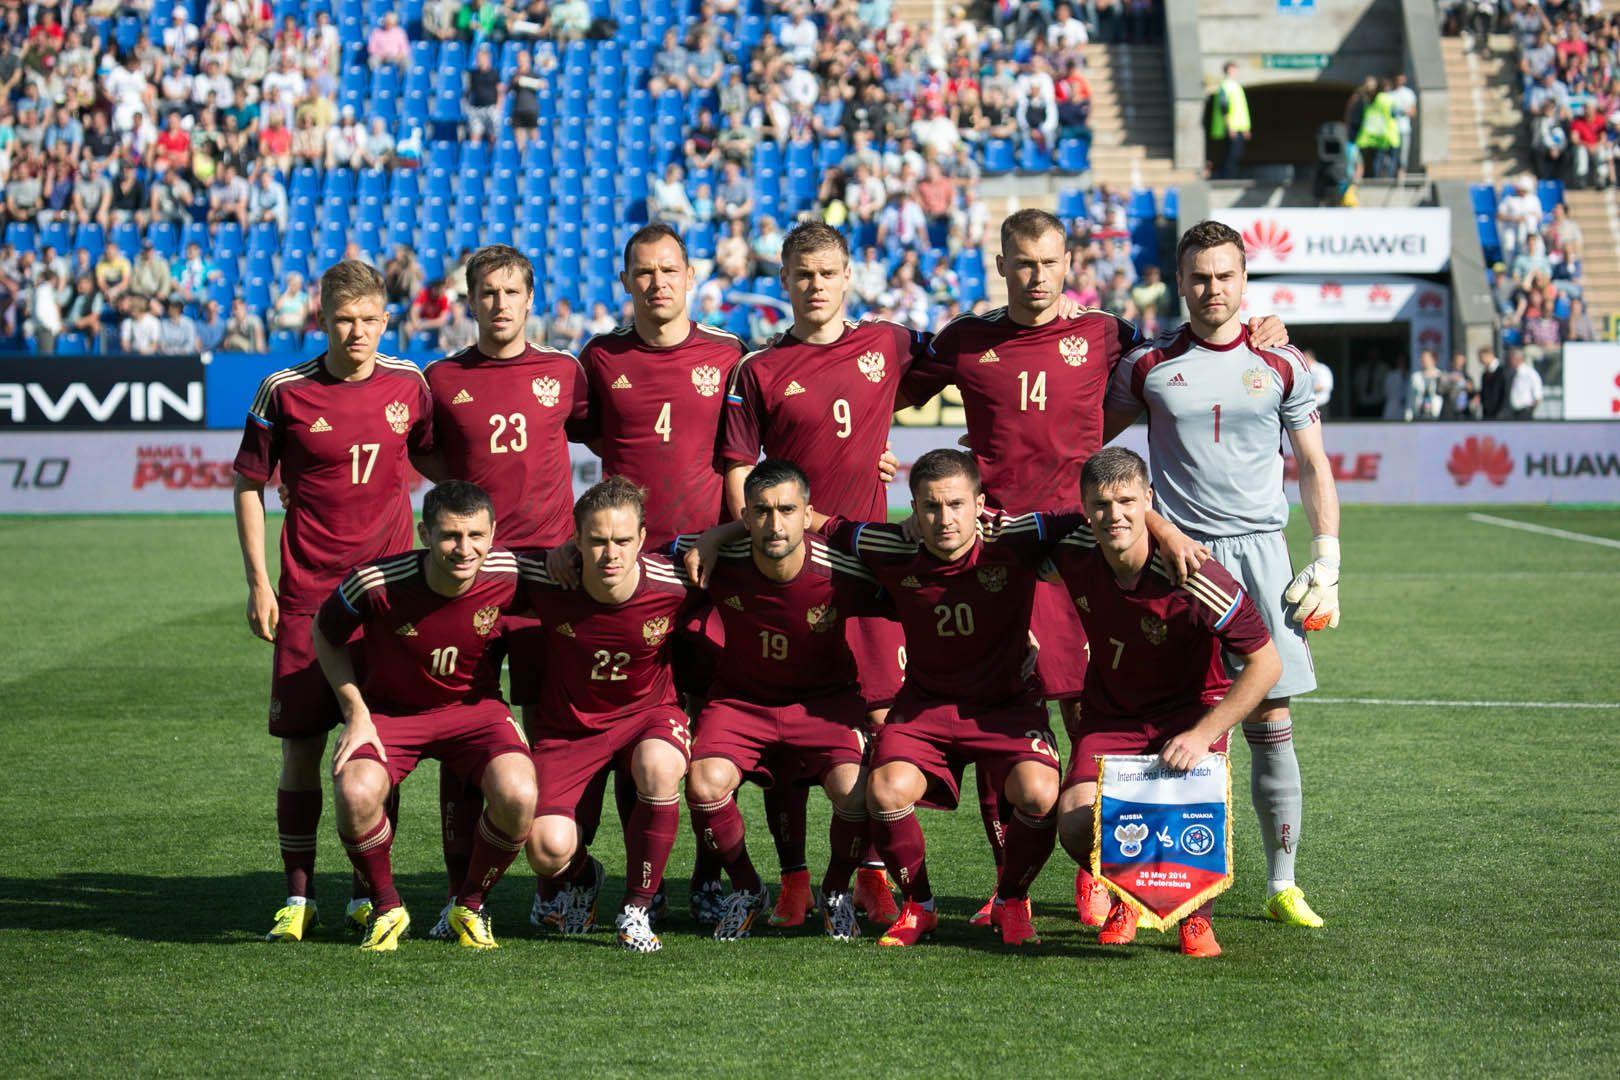 состав россии на чемпионат мира по футболу